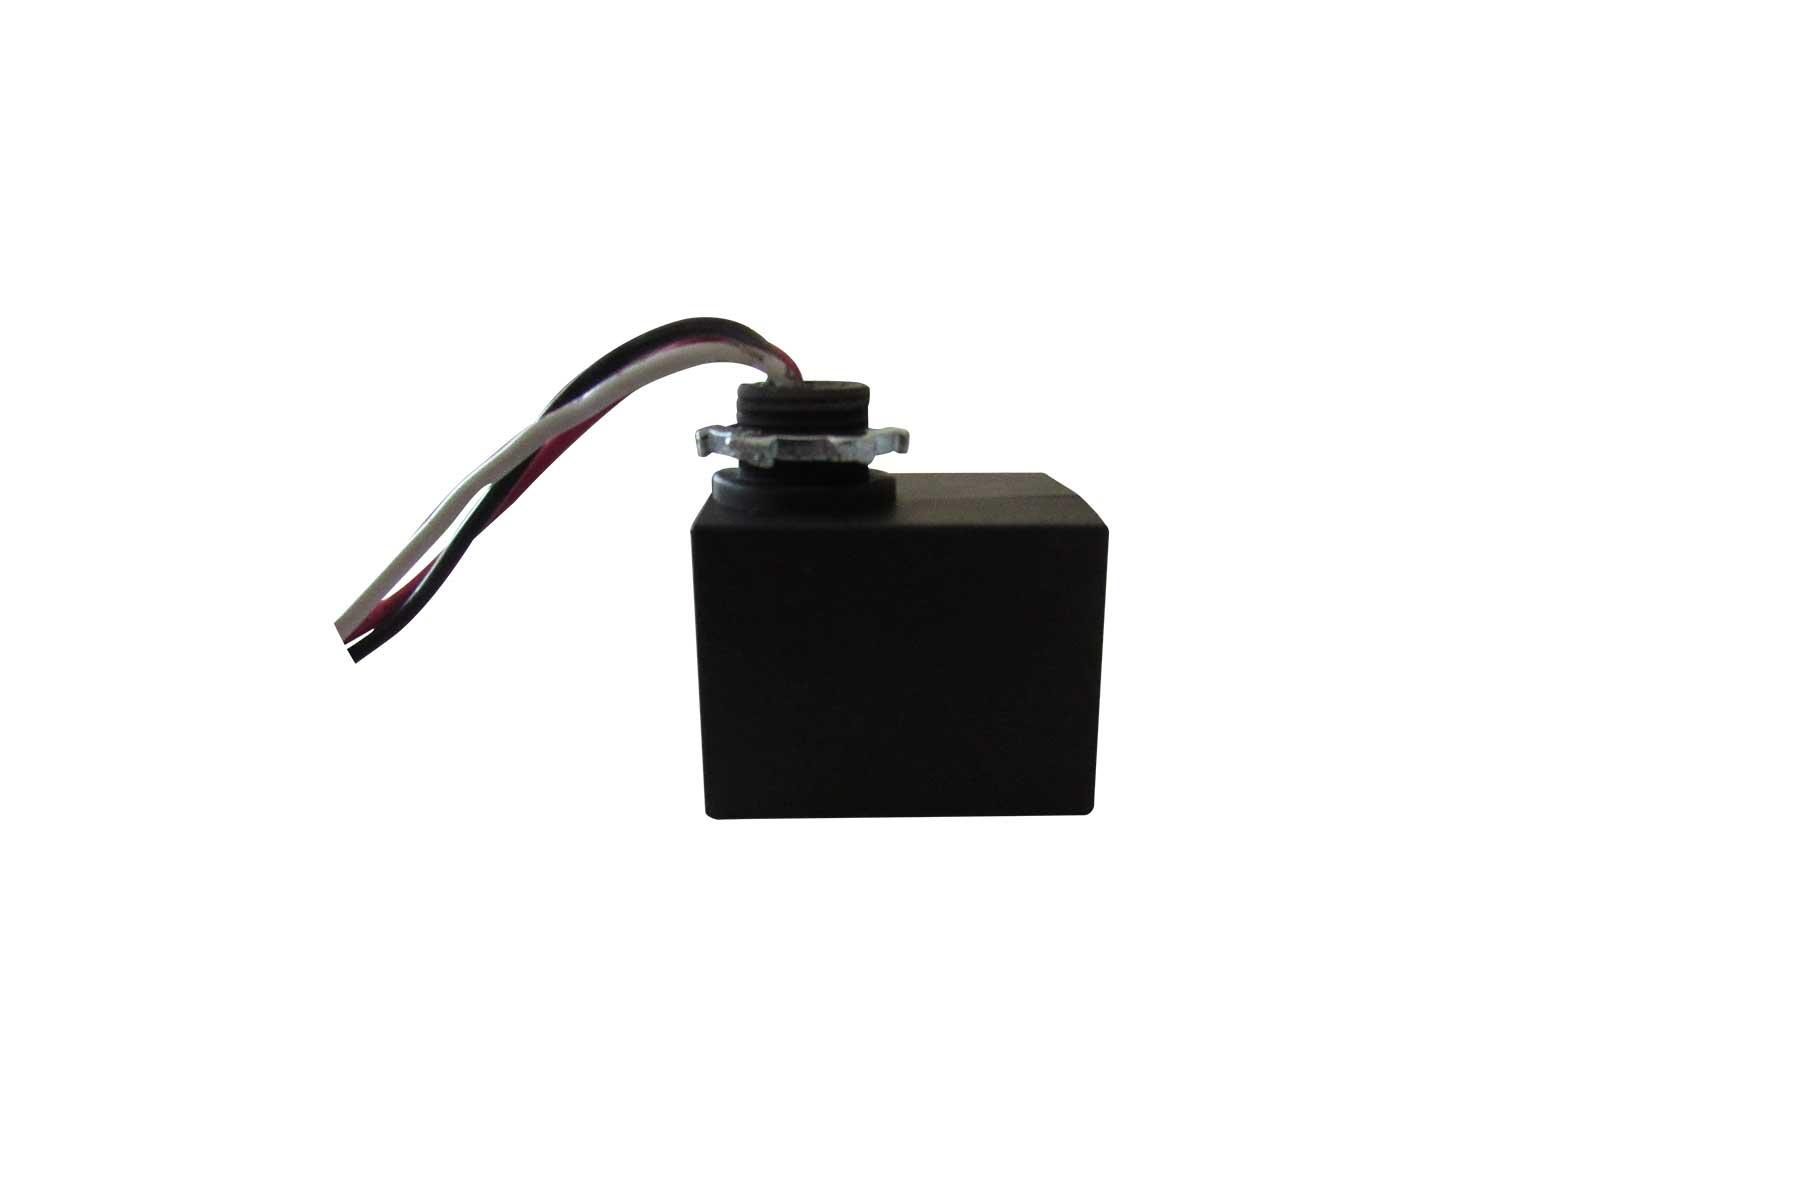 Line Voltage 347V to 240V Step Down Transformer - IP 50W Max - Open